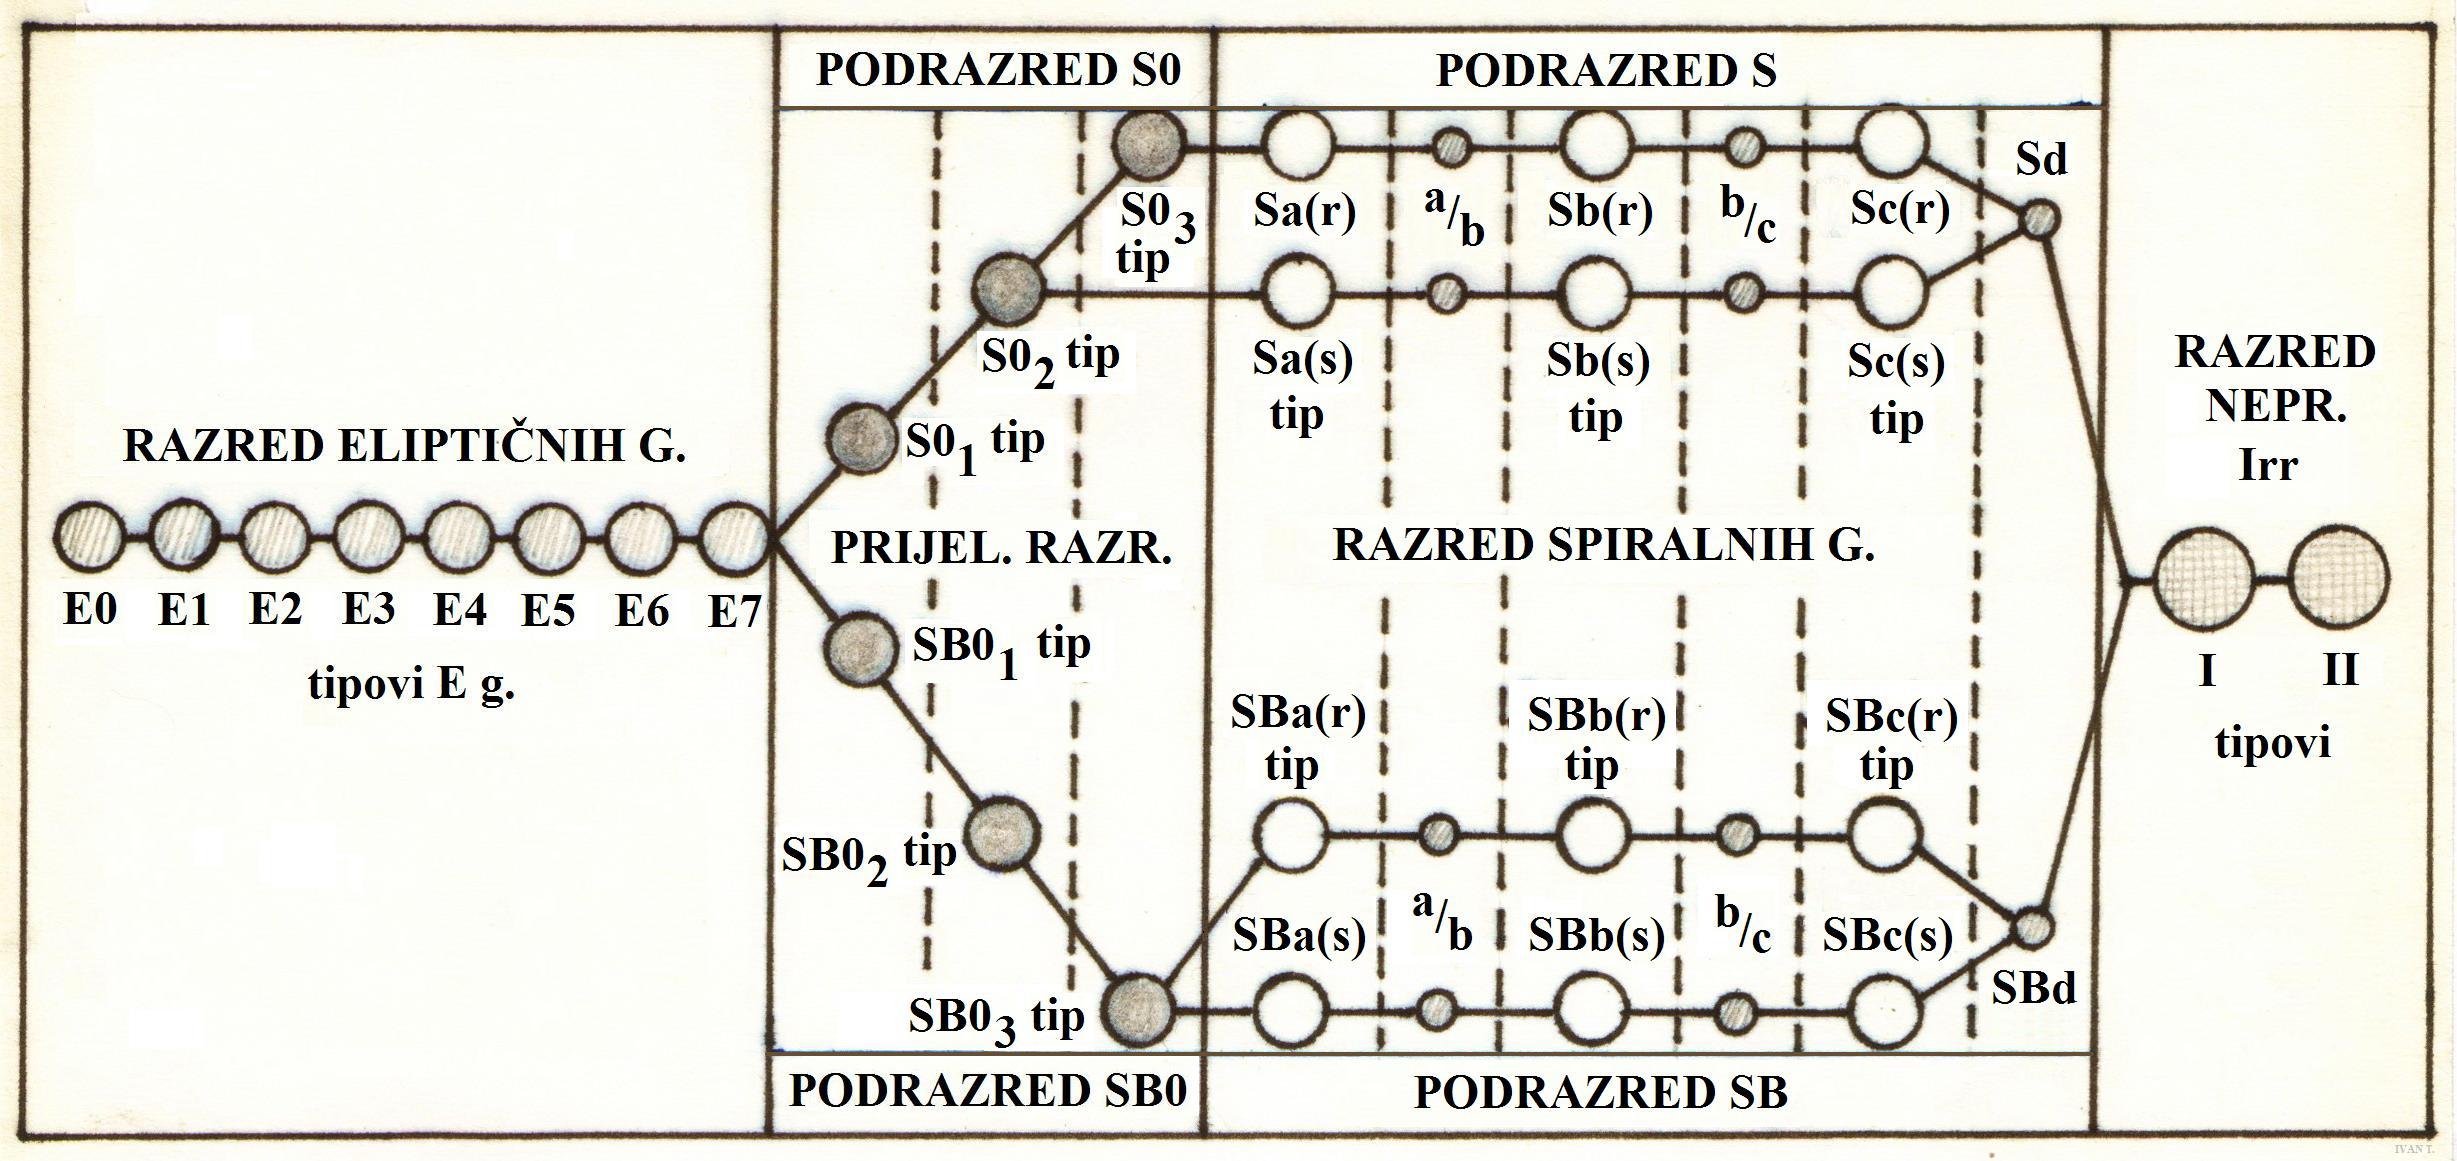 File Hubble Sandage Galaxy Classification Detailed 02